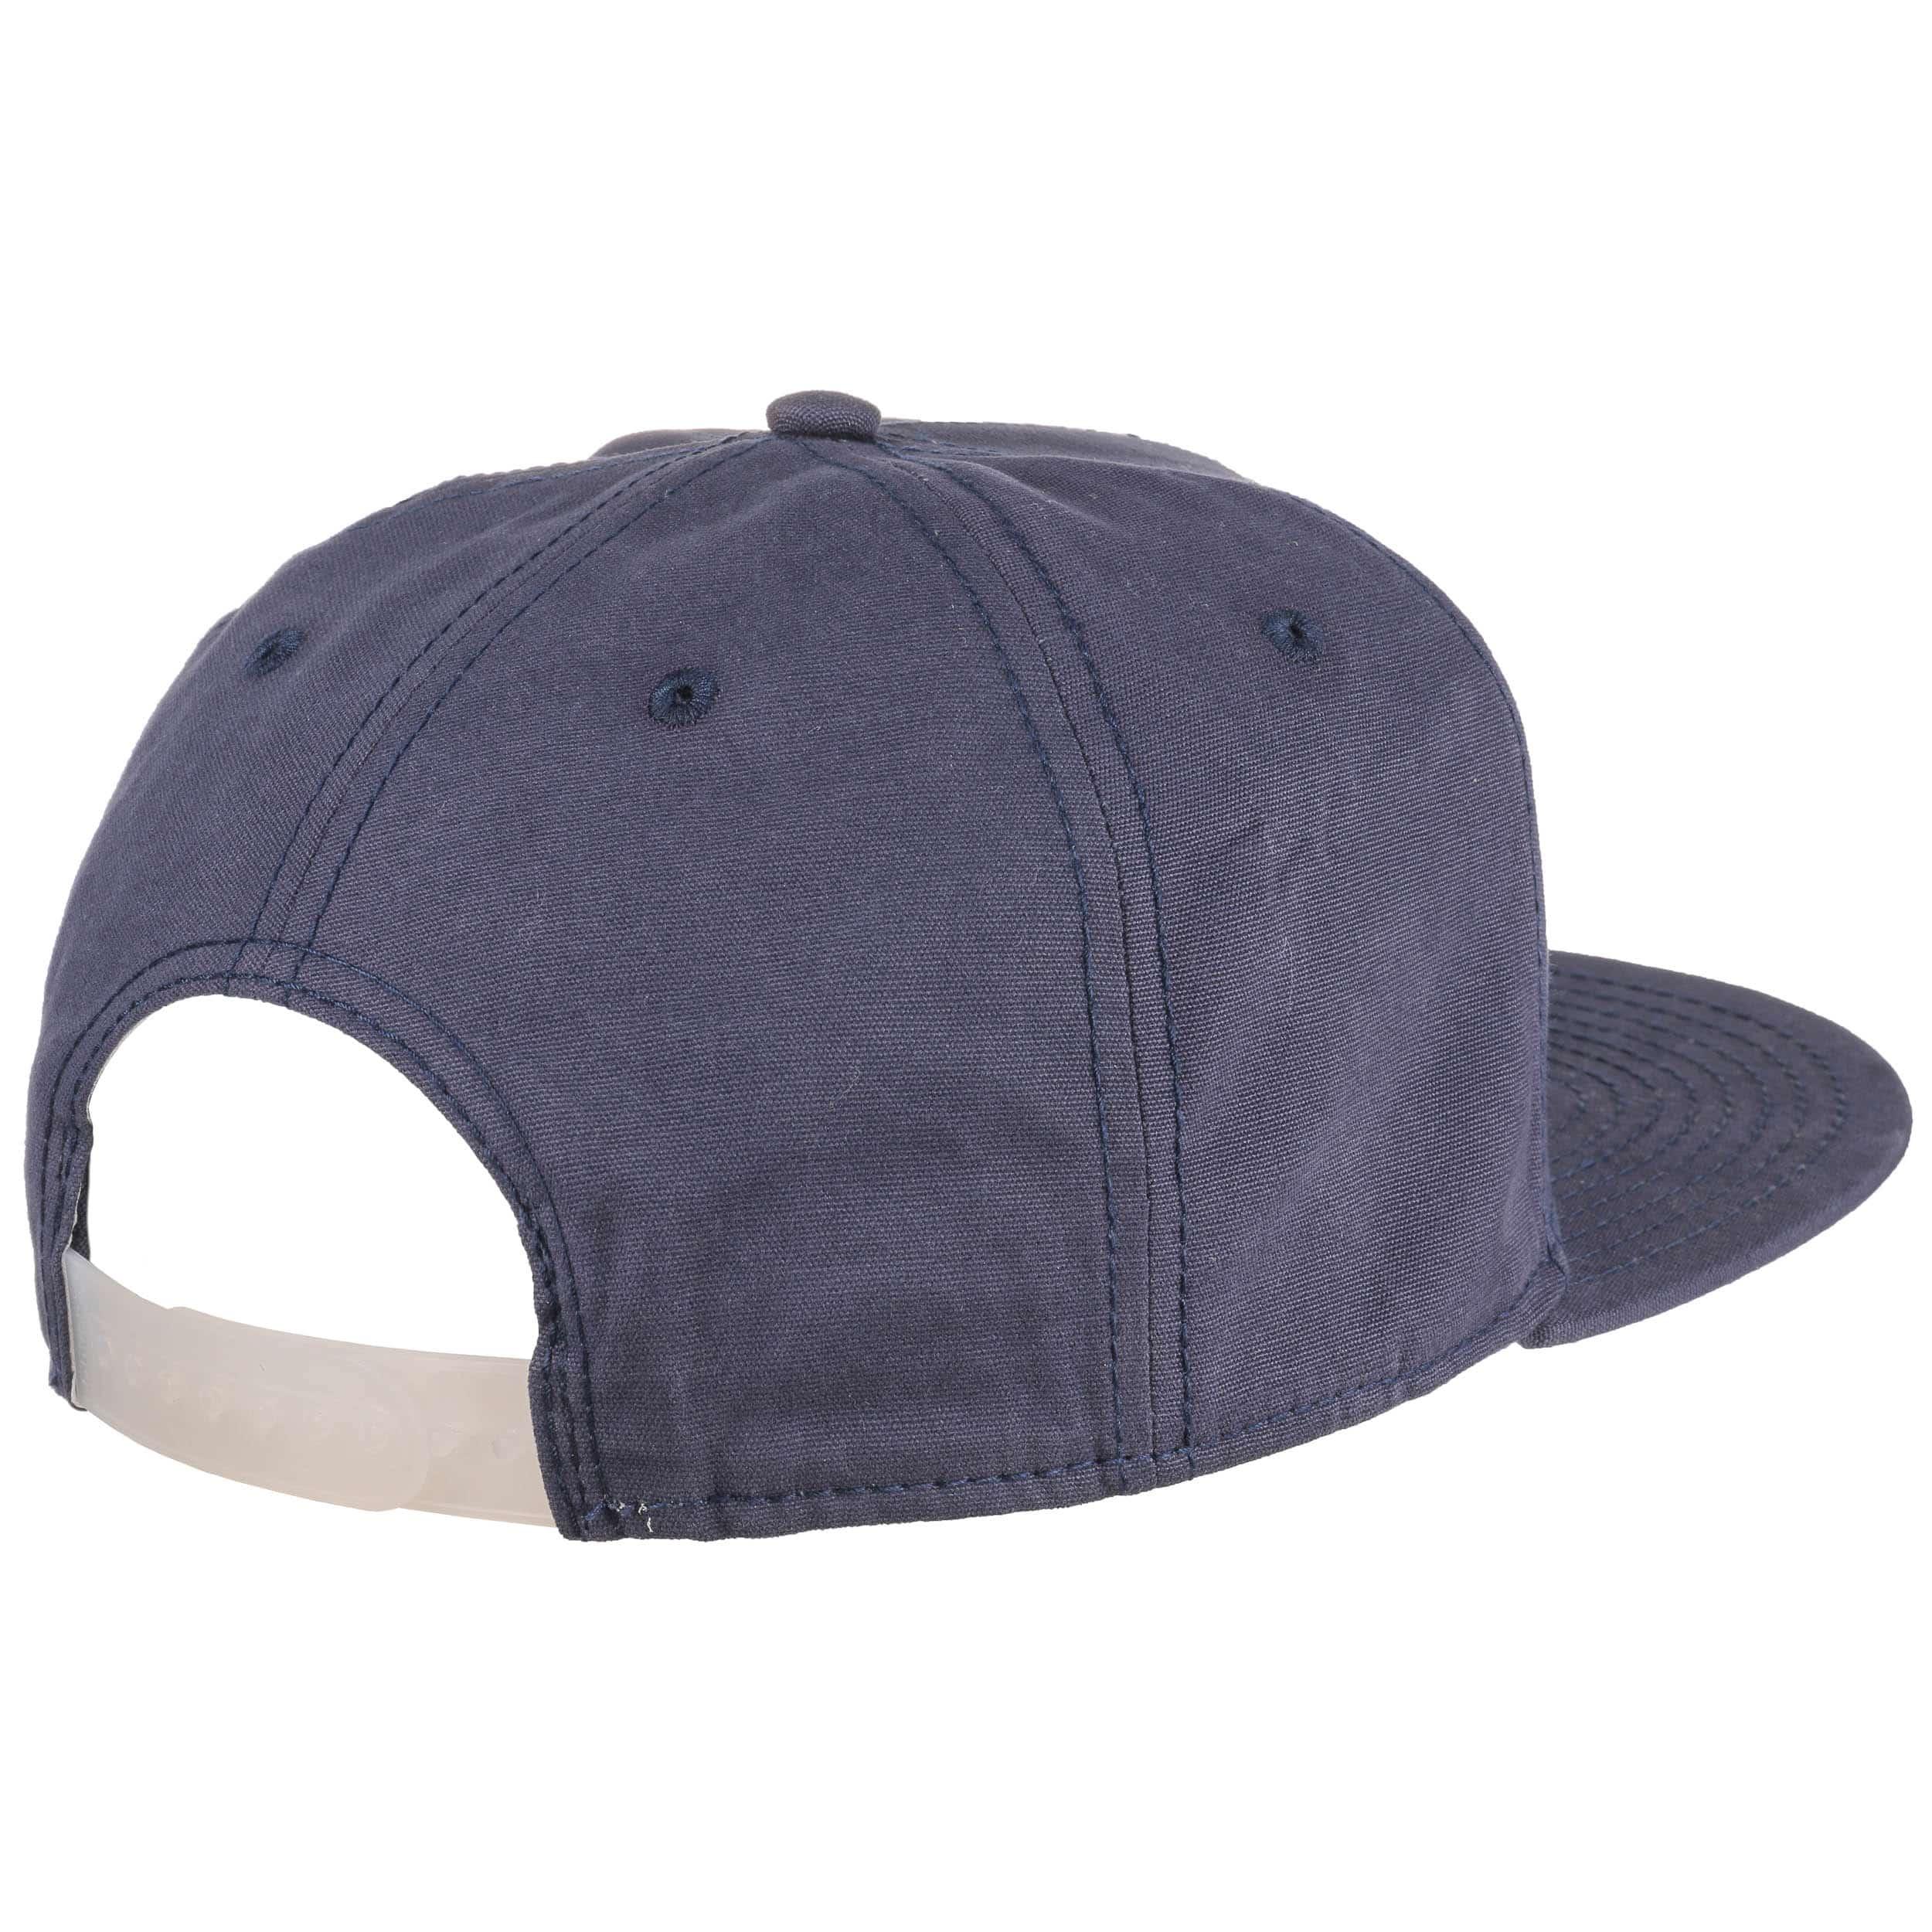 5601741a1f5 ... Translucent C Snapback Cap by Converse - blue 3 ...